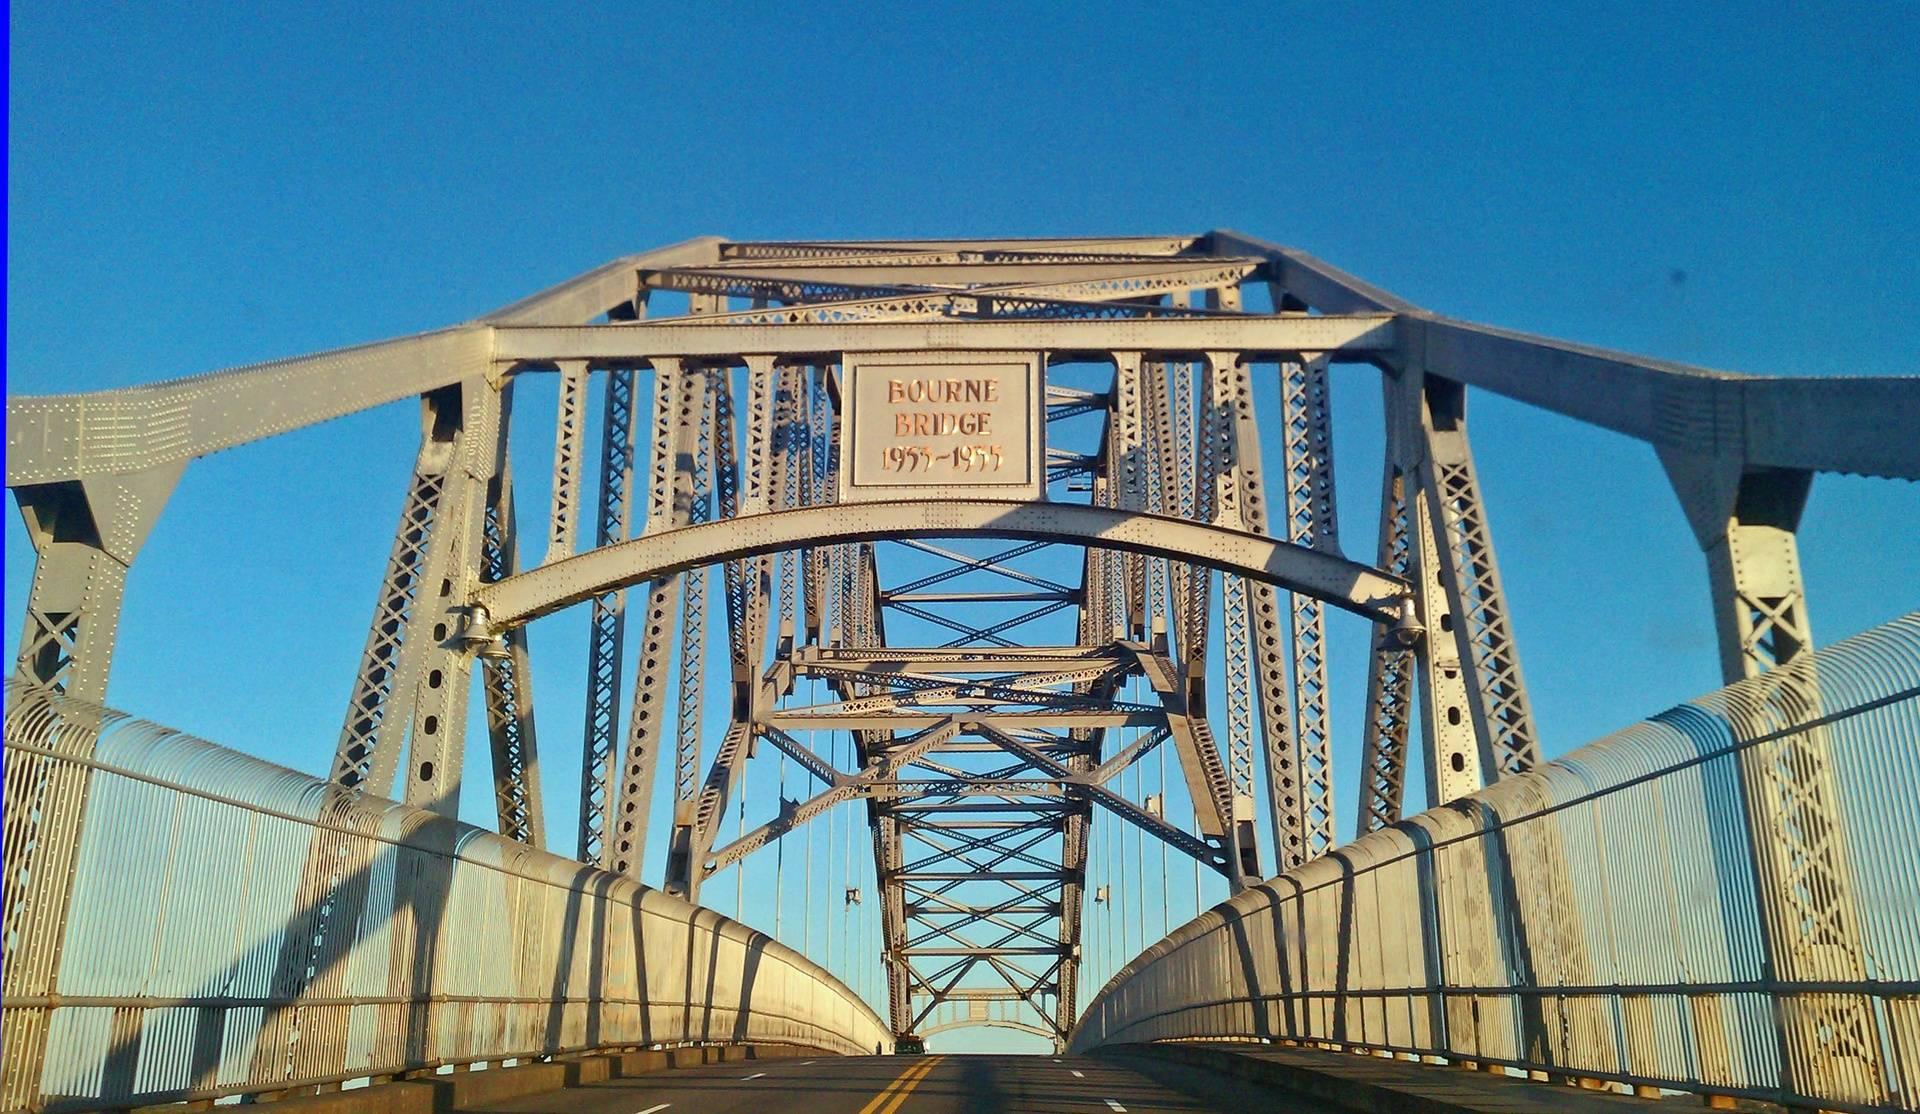 Crossing the Bourne Bridge